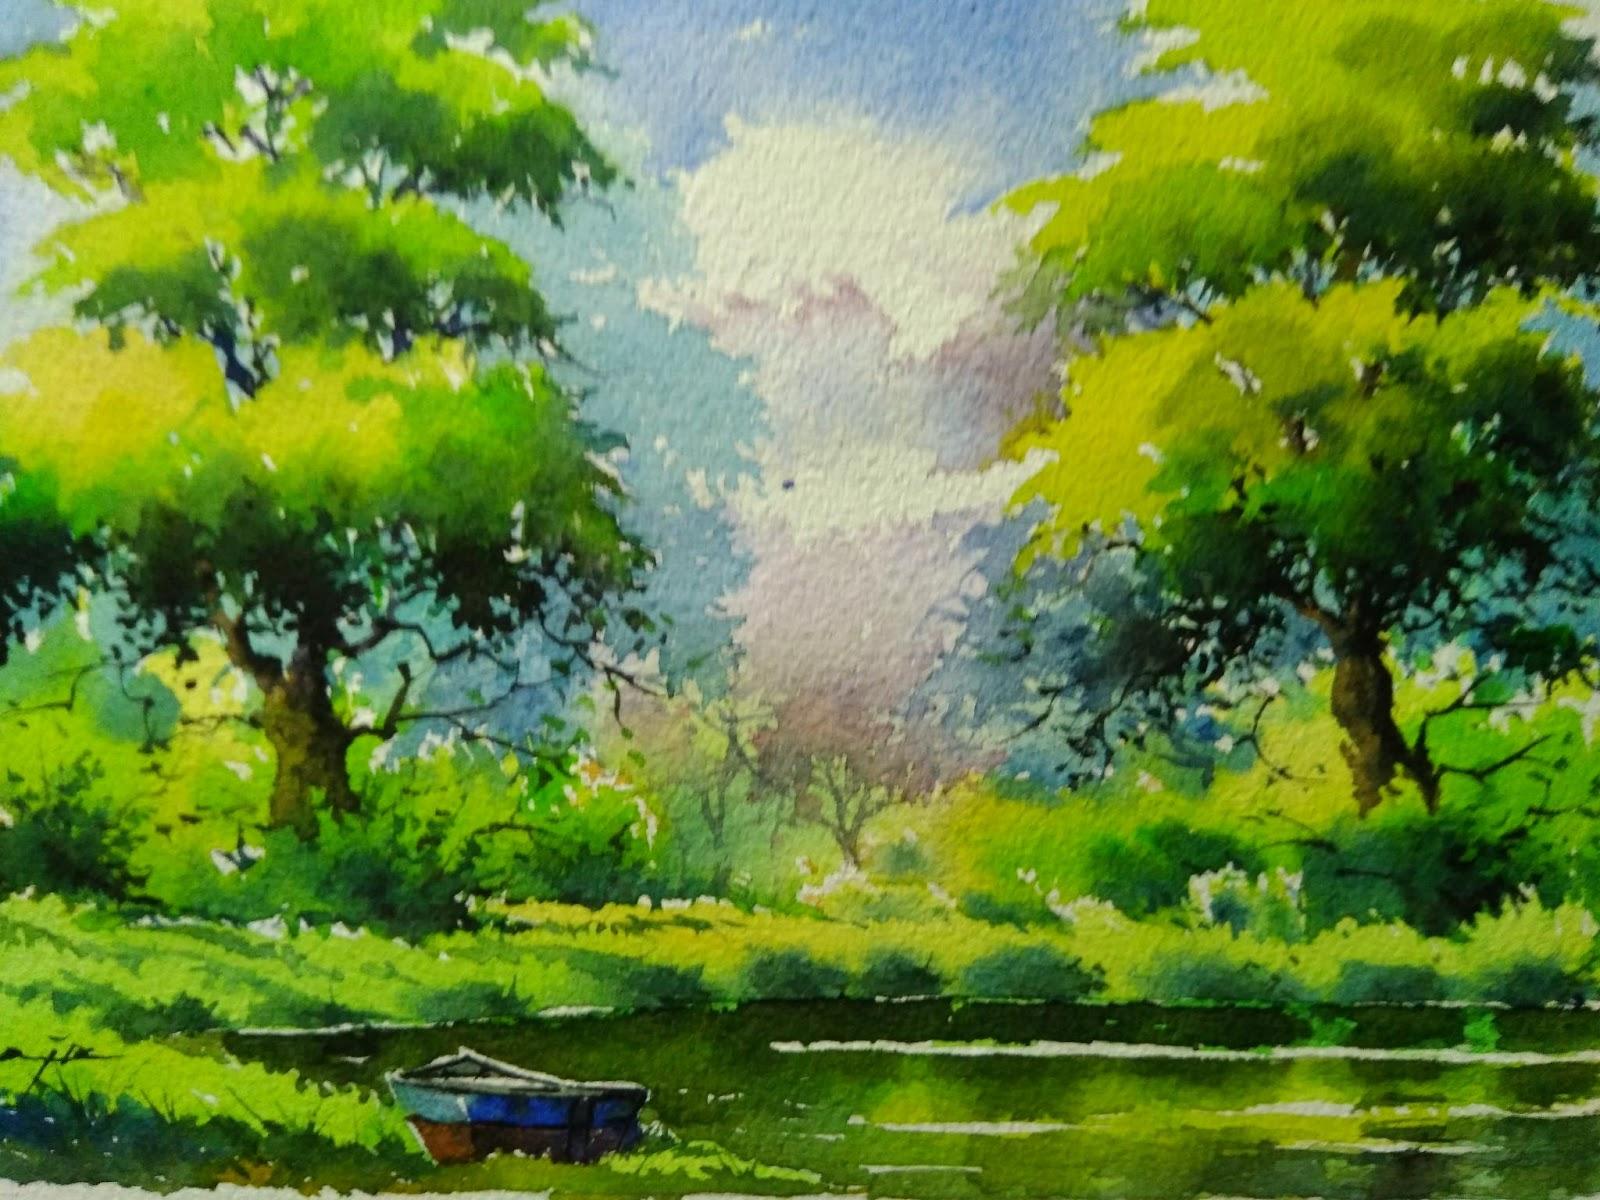 1600x1200 Watercolor Landscape On Handmade Paper